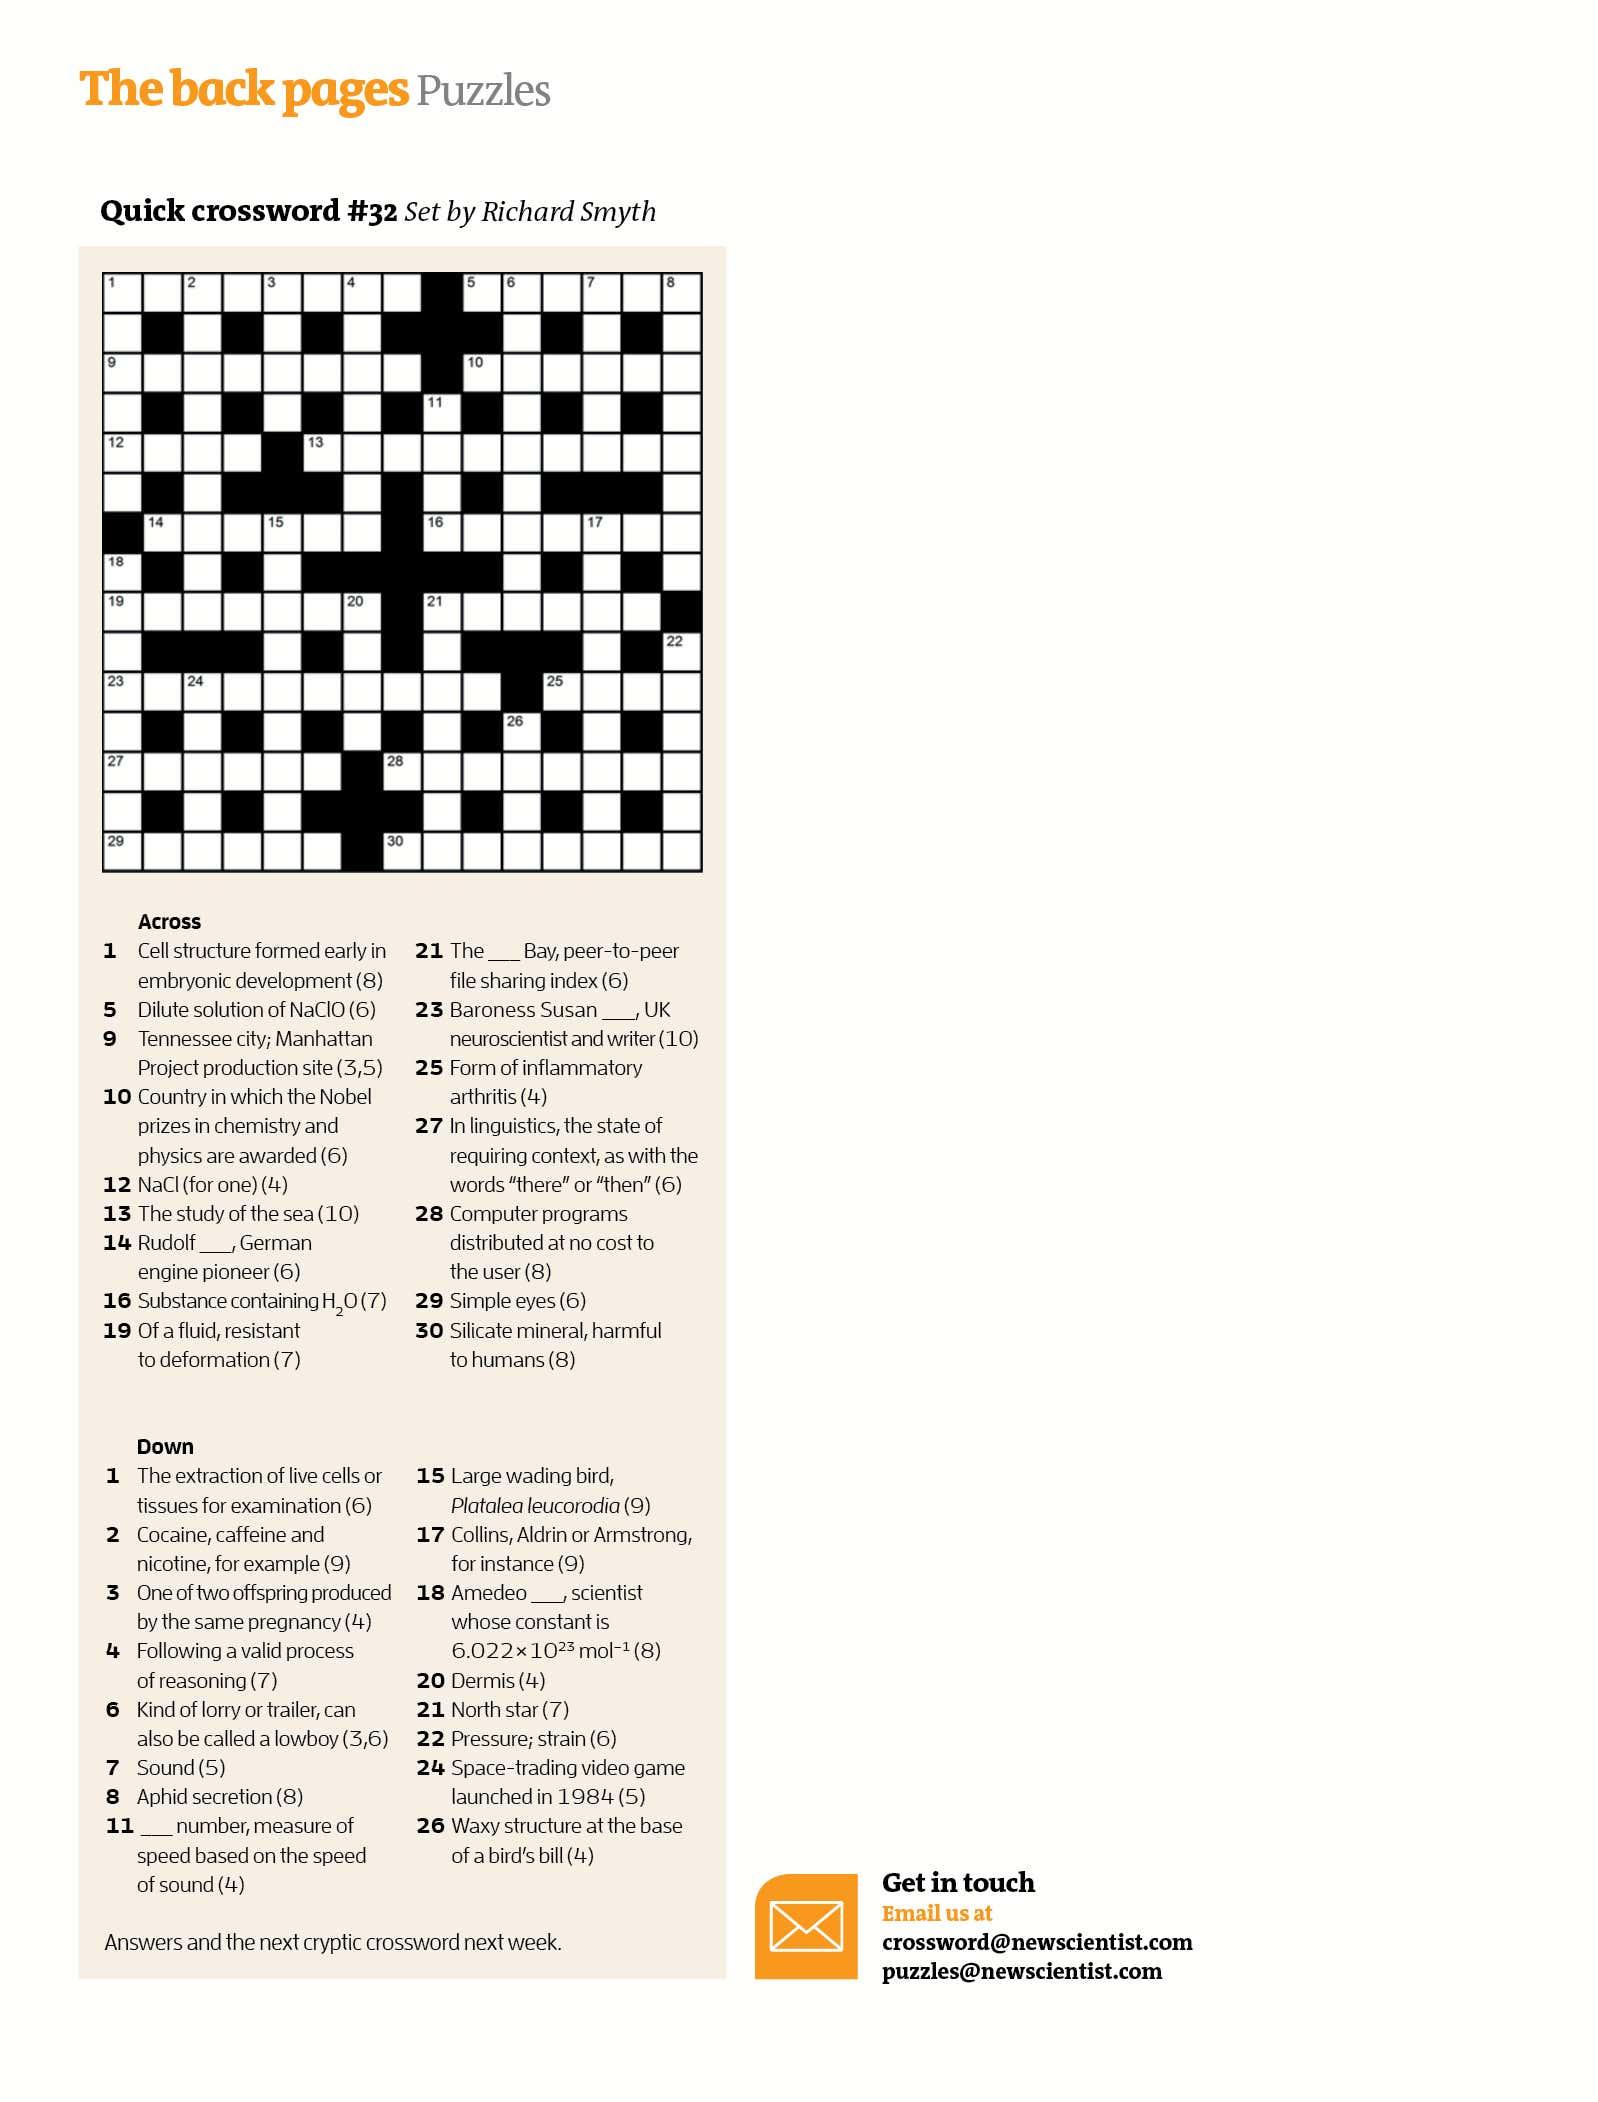 Quick Crossword #32 | New Scientist - Printable Quick Crossword Puzzles